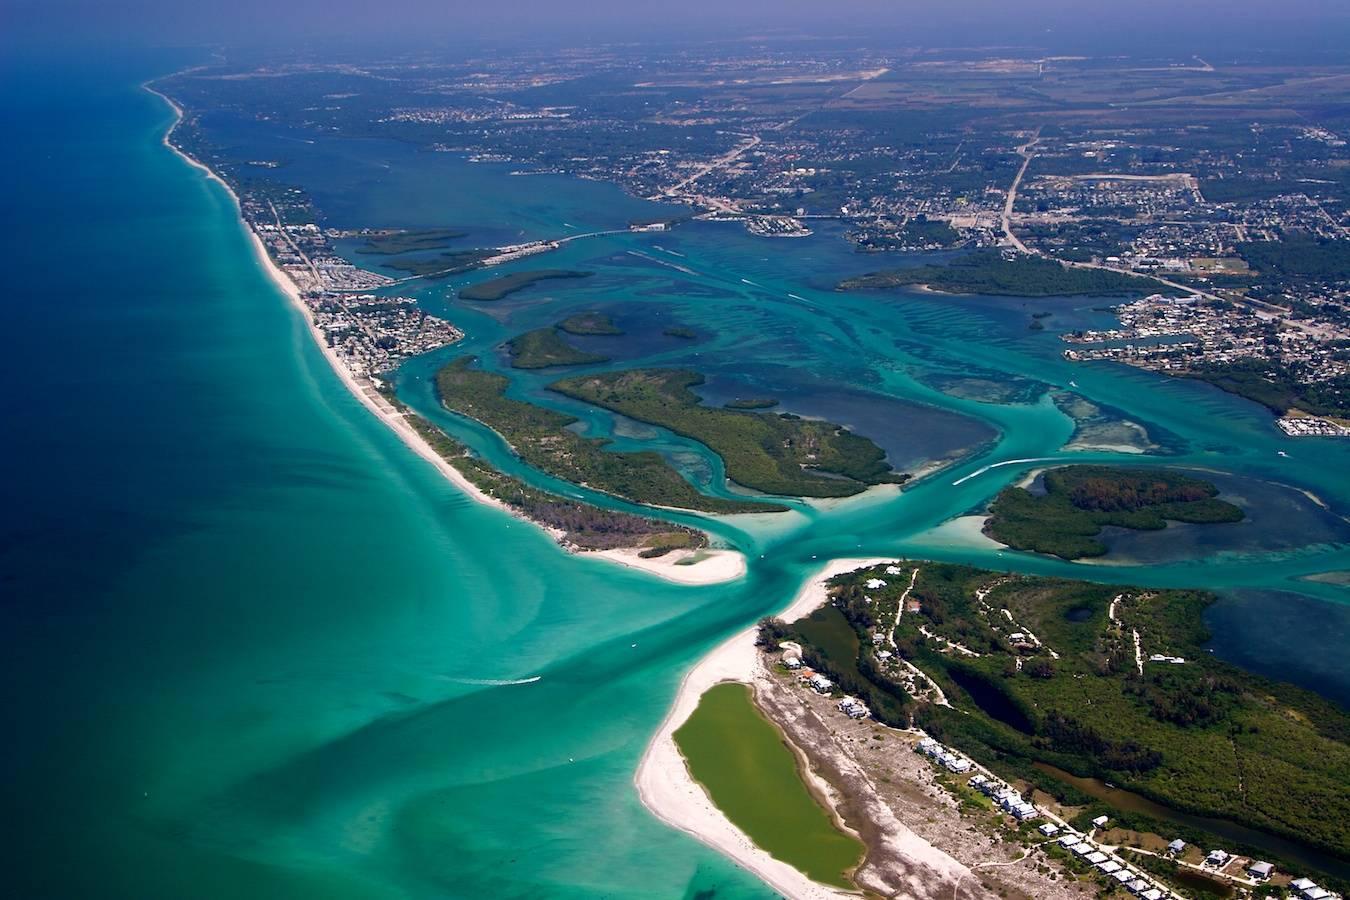 Englewood Florida's Manasota Key Beach